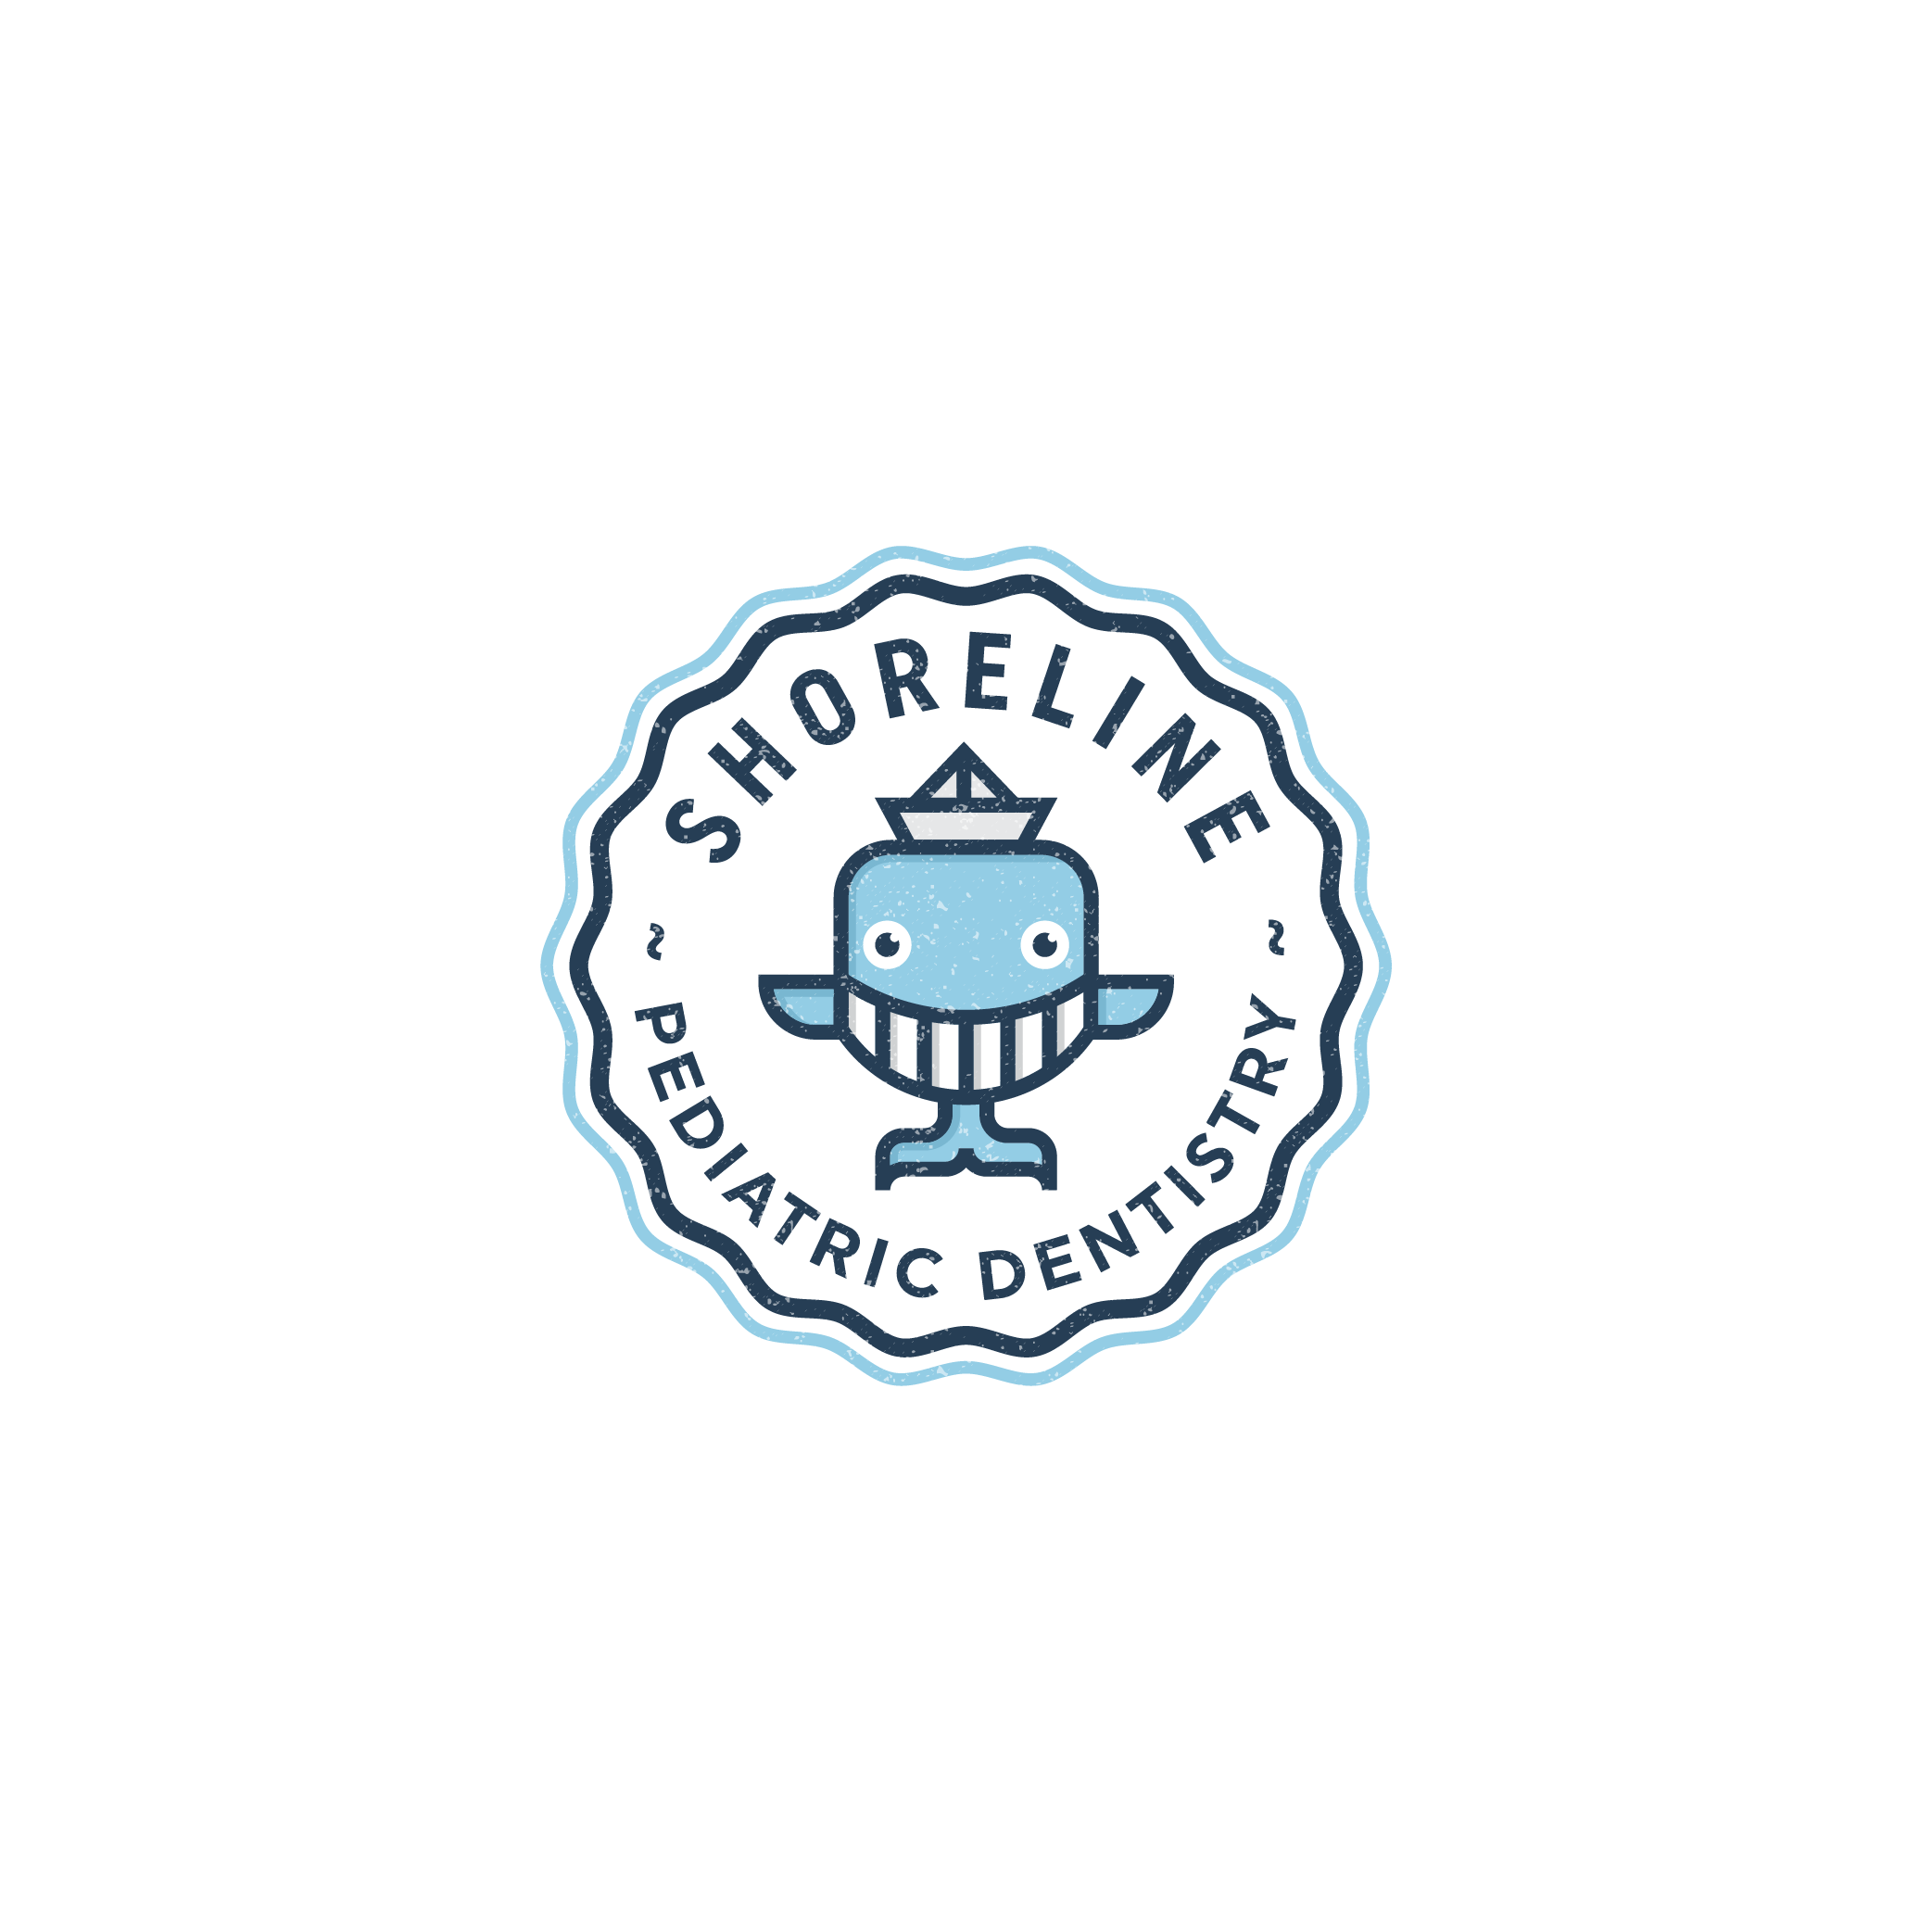 Logo_Collection_090917_Shoreline-01.png